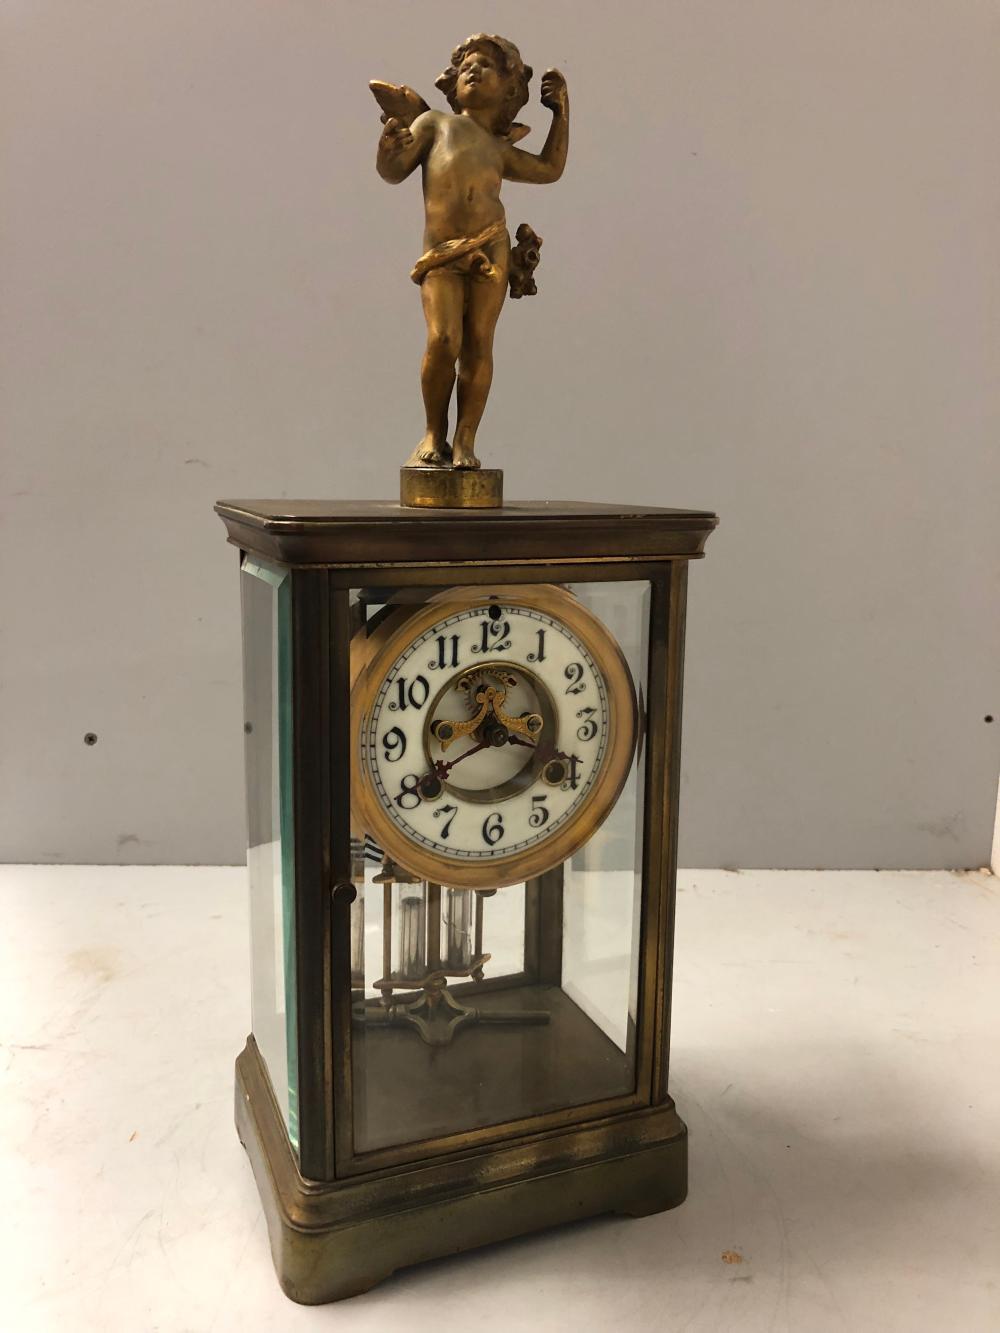 Waterbury Crystal Regulator Clock